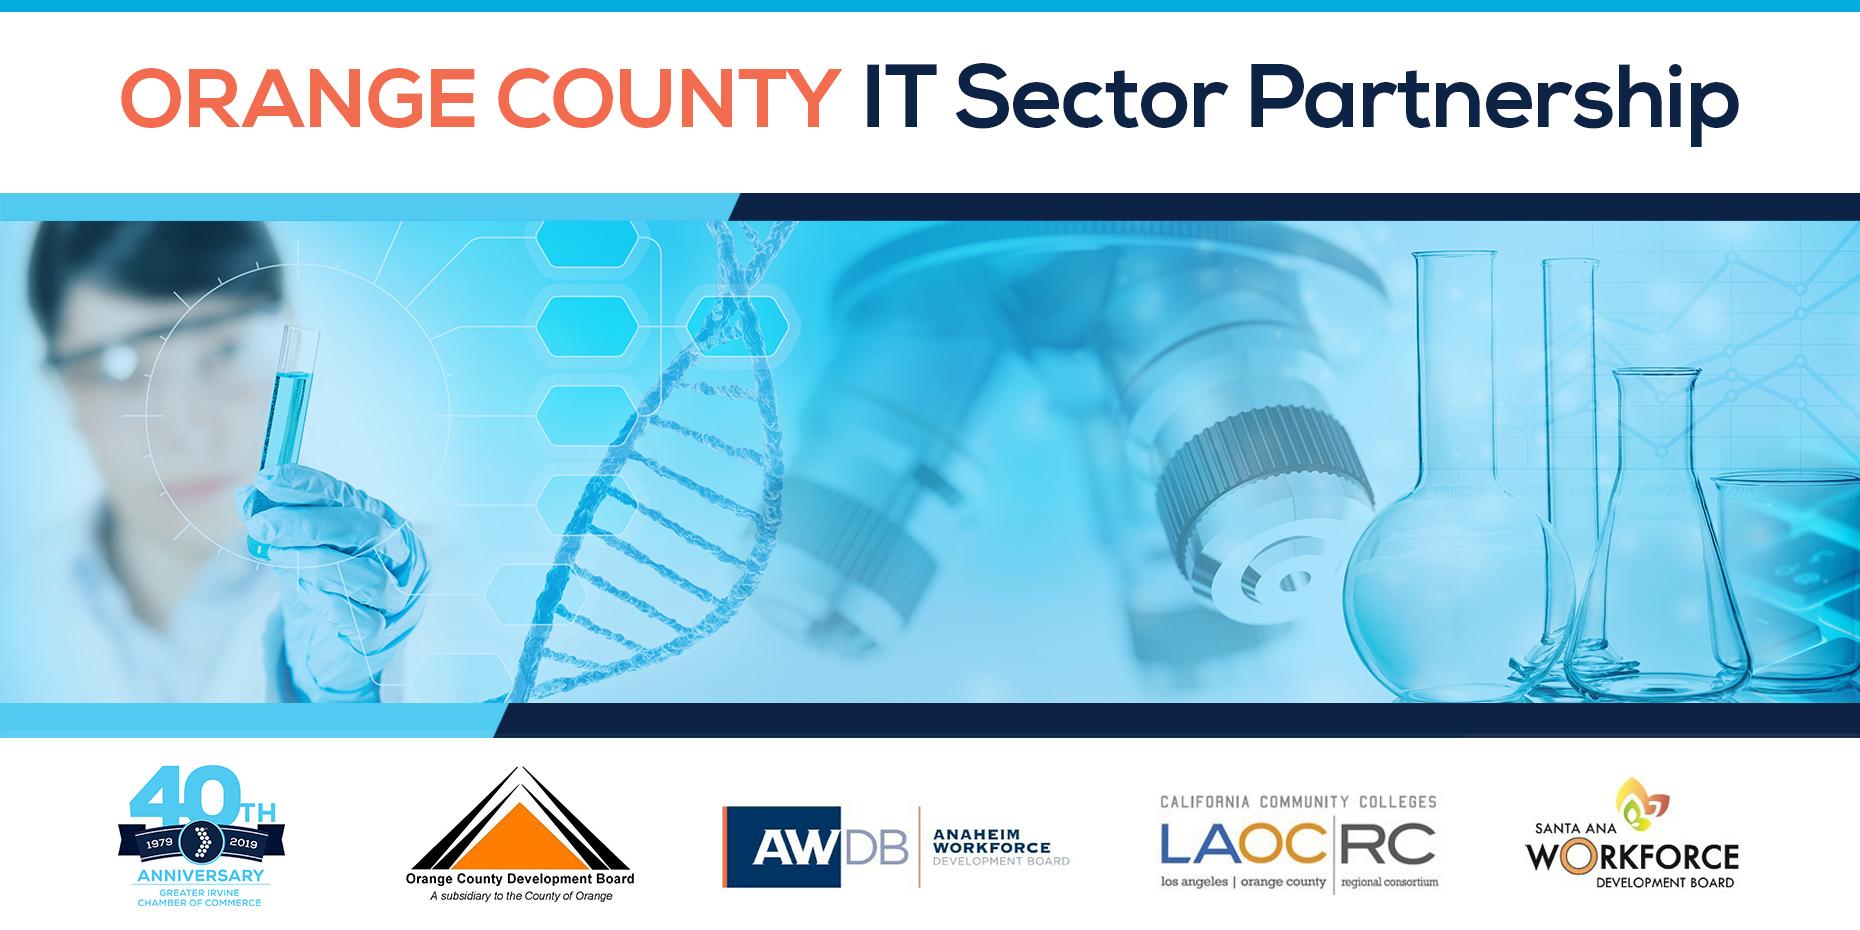 Orange County IT Sector Partnership